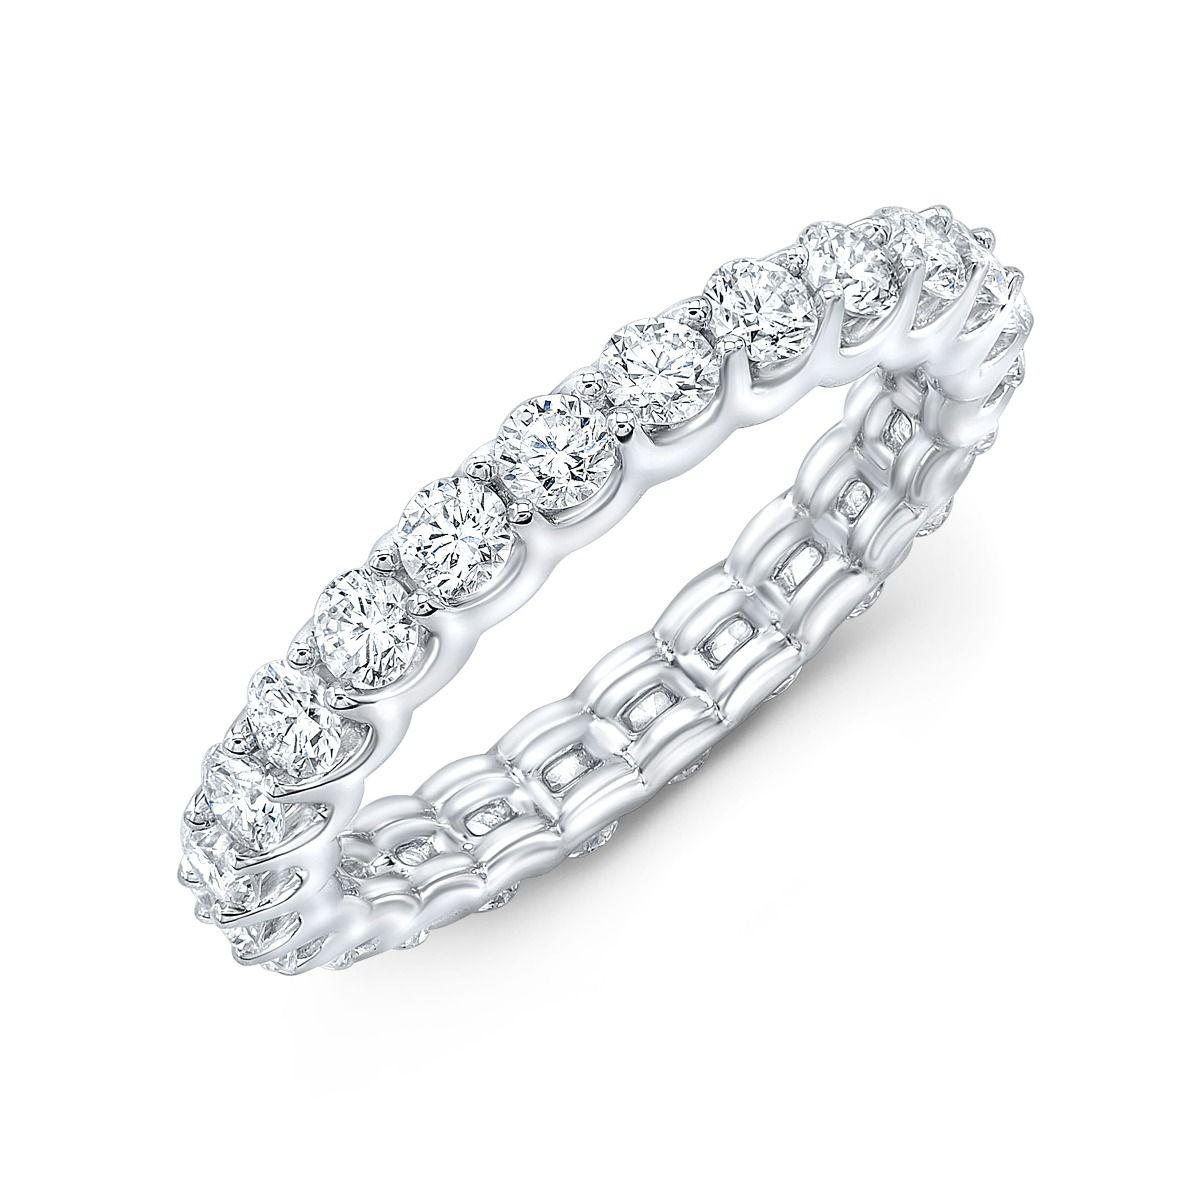 1.2 Carat Round Diamond Eternity Band With u-setting design